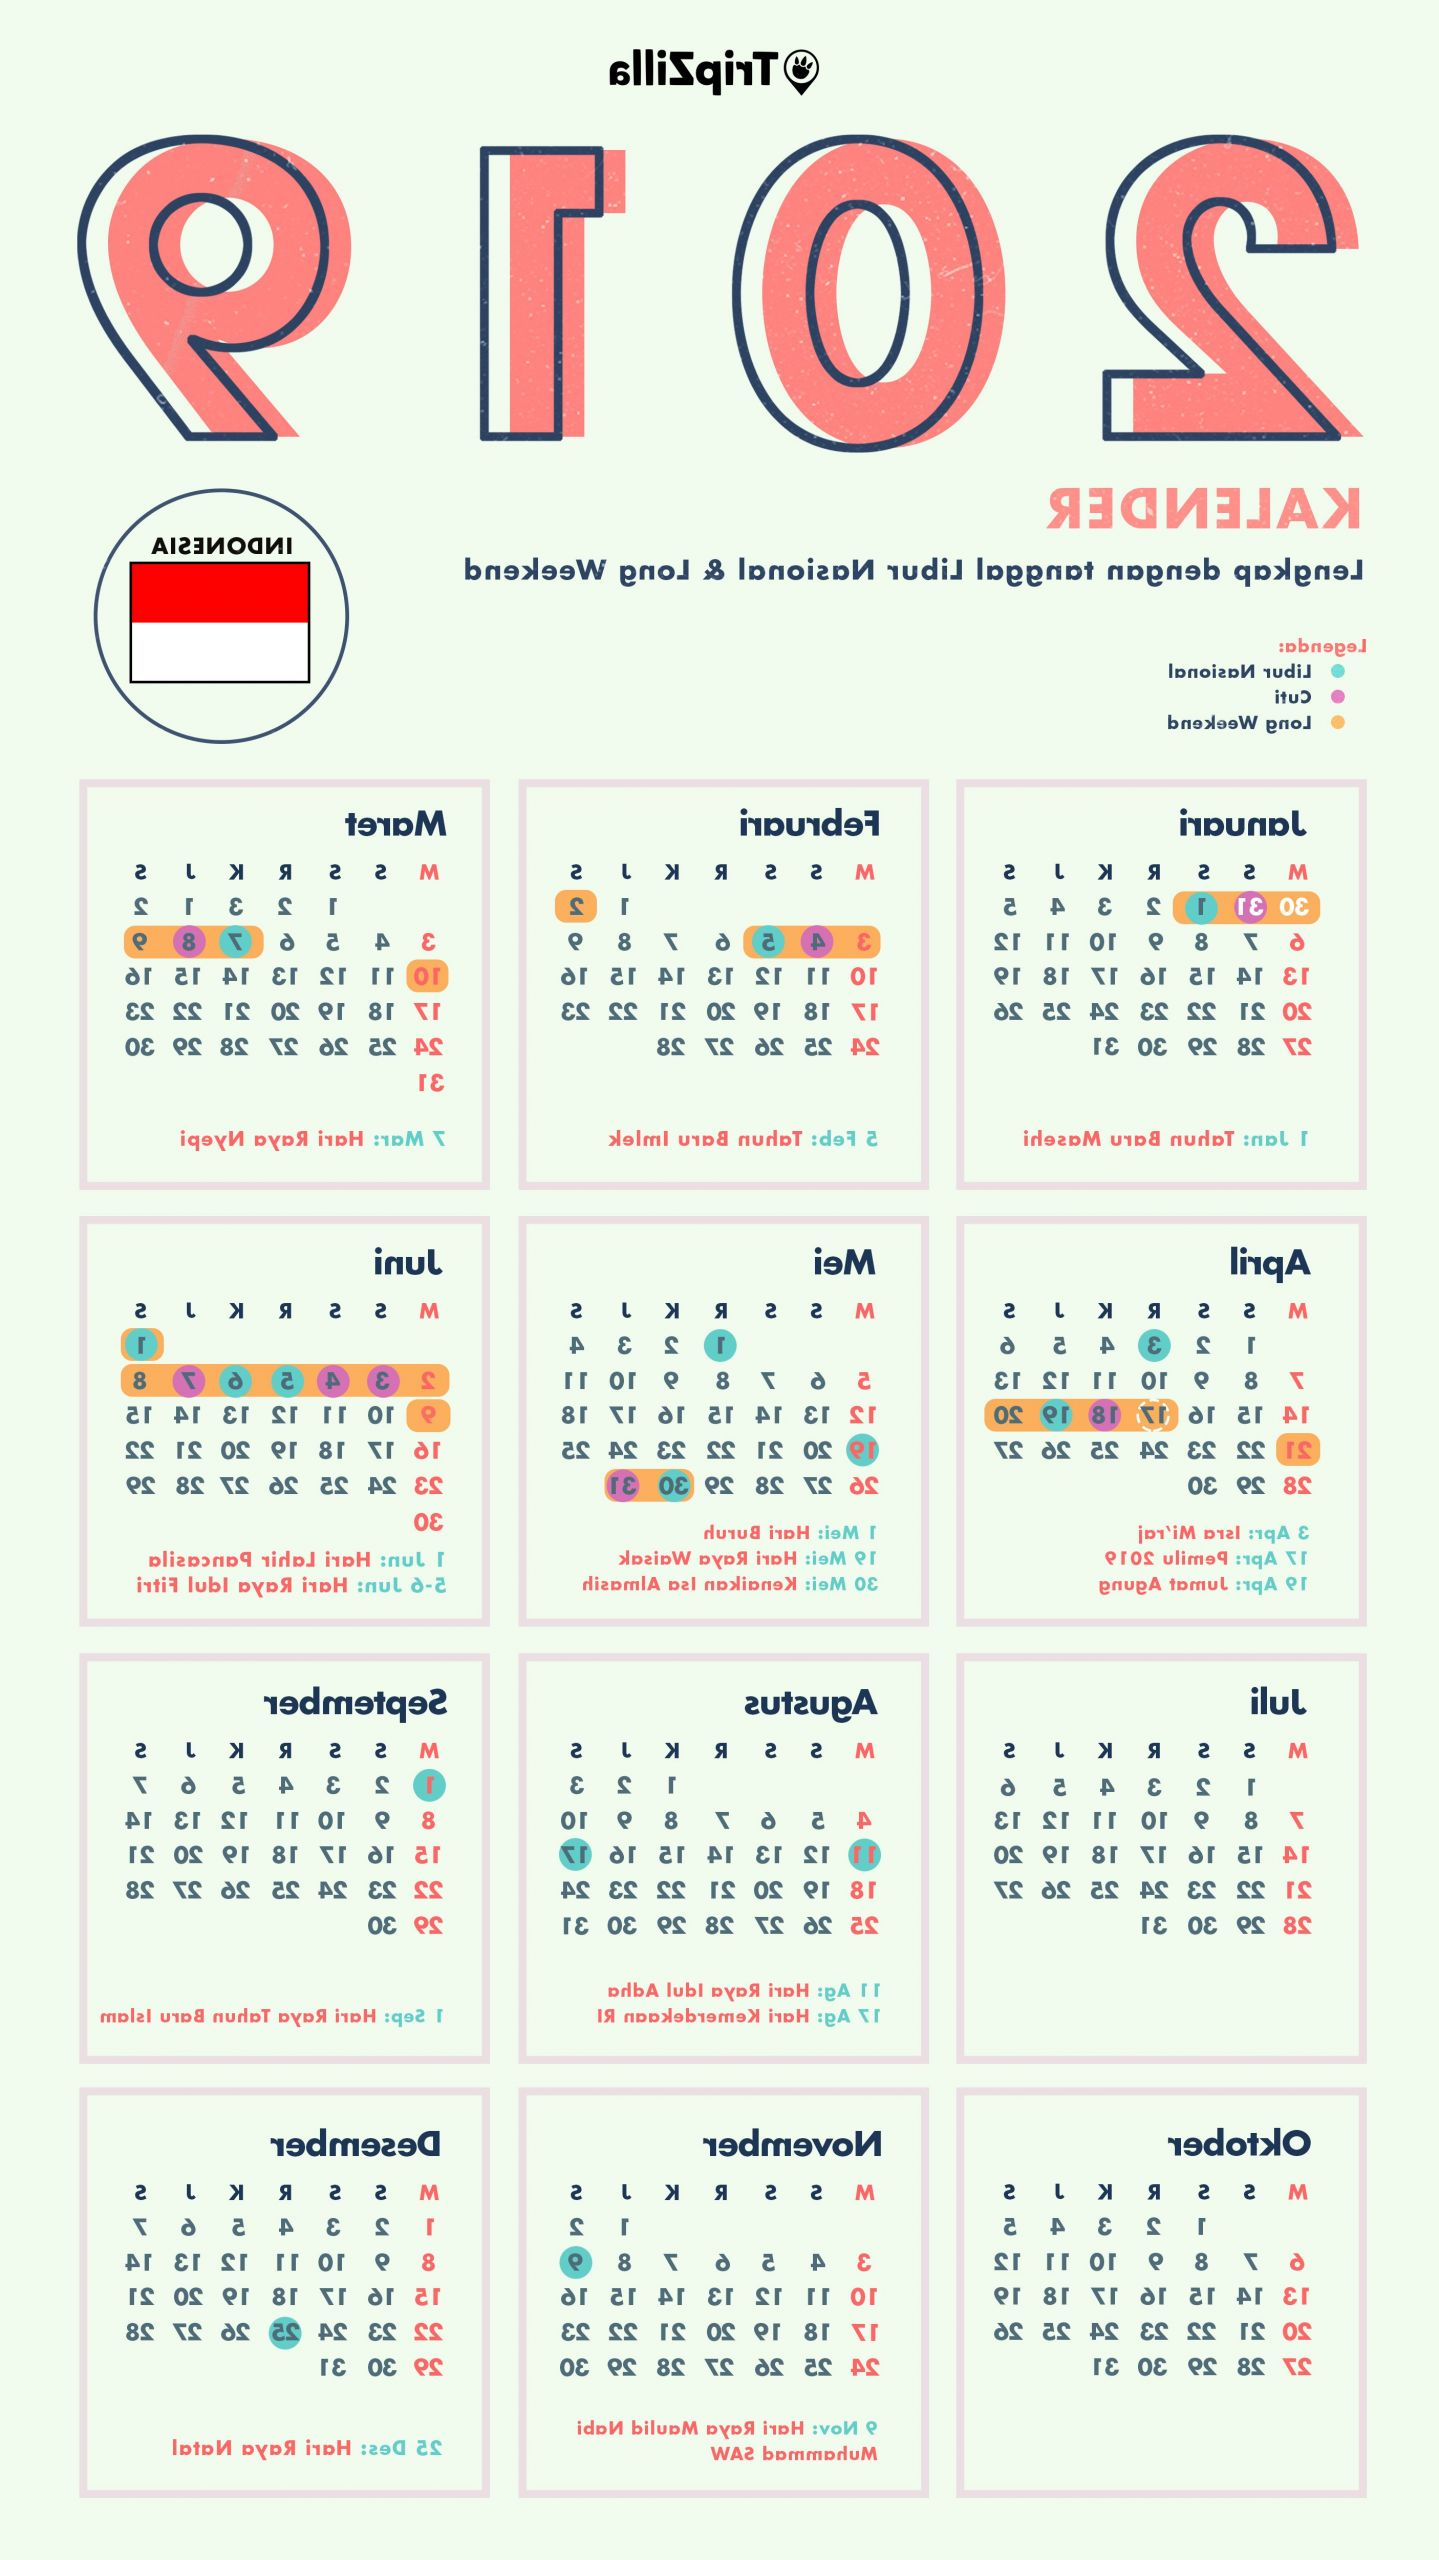 Design Model Baju Lebaran Tahun 2019 Fmdf Lebaran Tahun 2019 Jatuh Pada Tanggal Berapa Ramadhan Gg